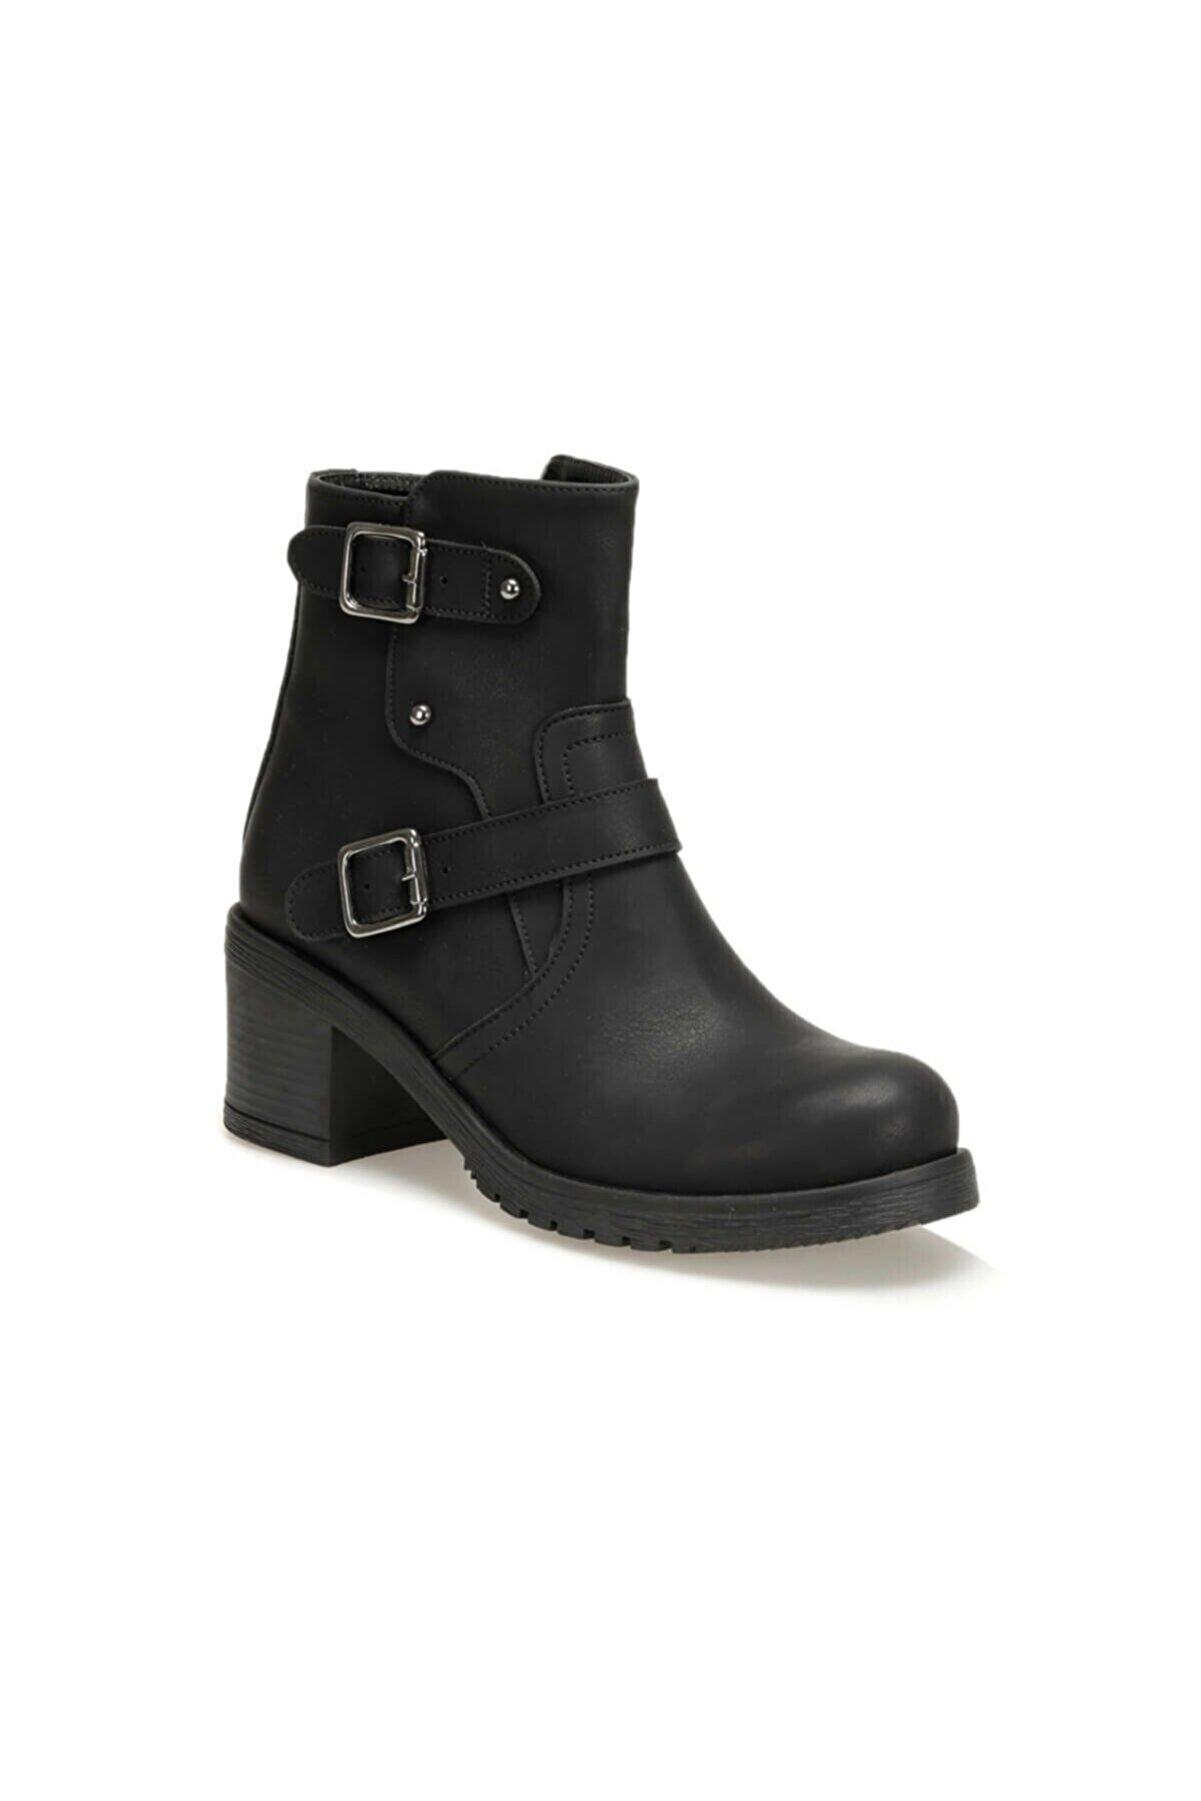 Art Bella CW19032 Siyah Kadın Topuklu Ayakkabı 100440352